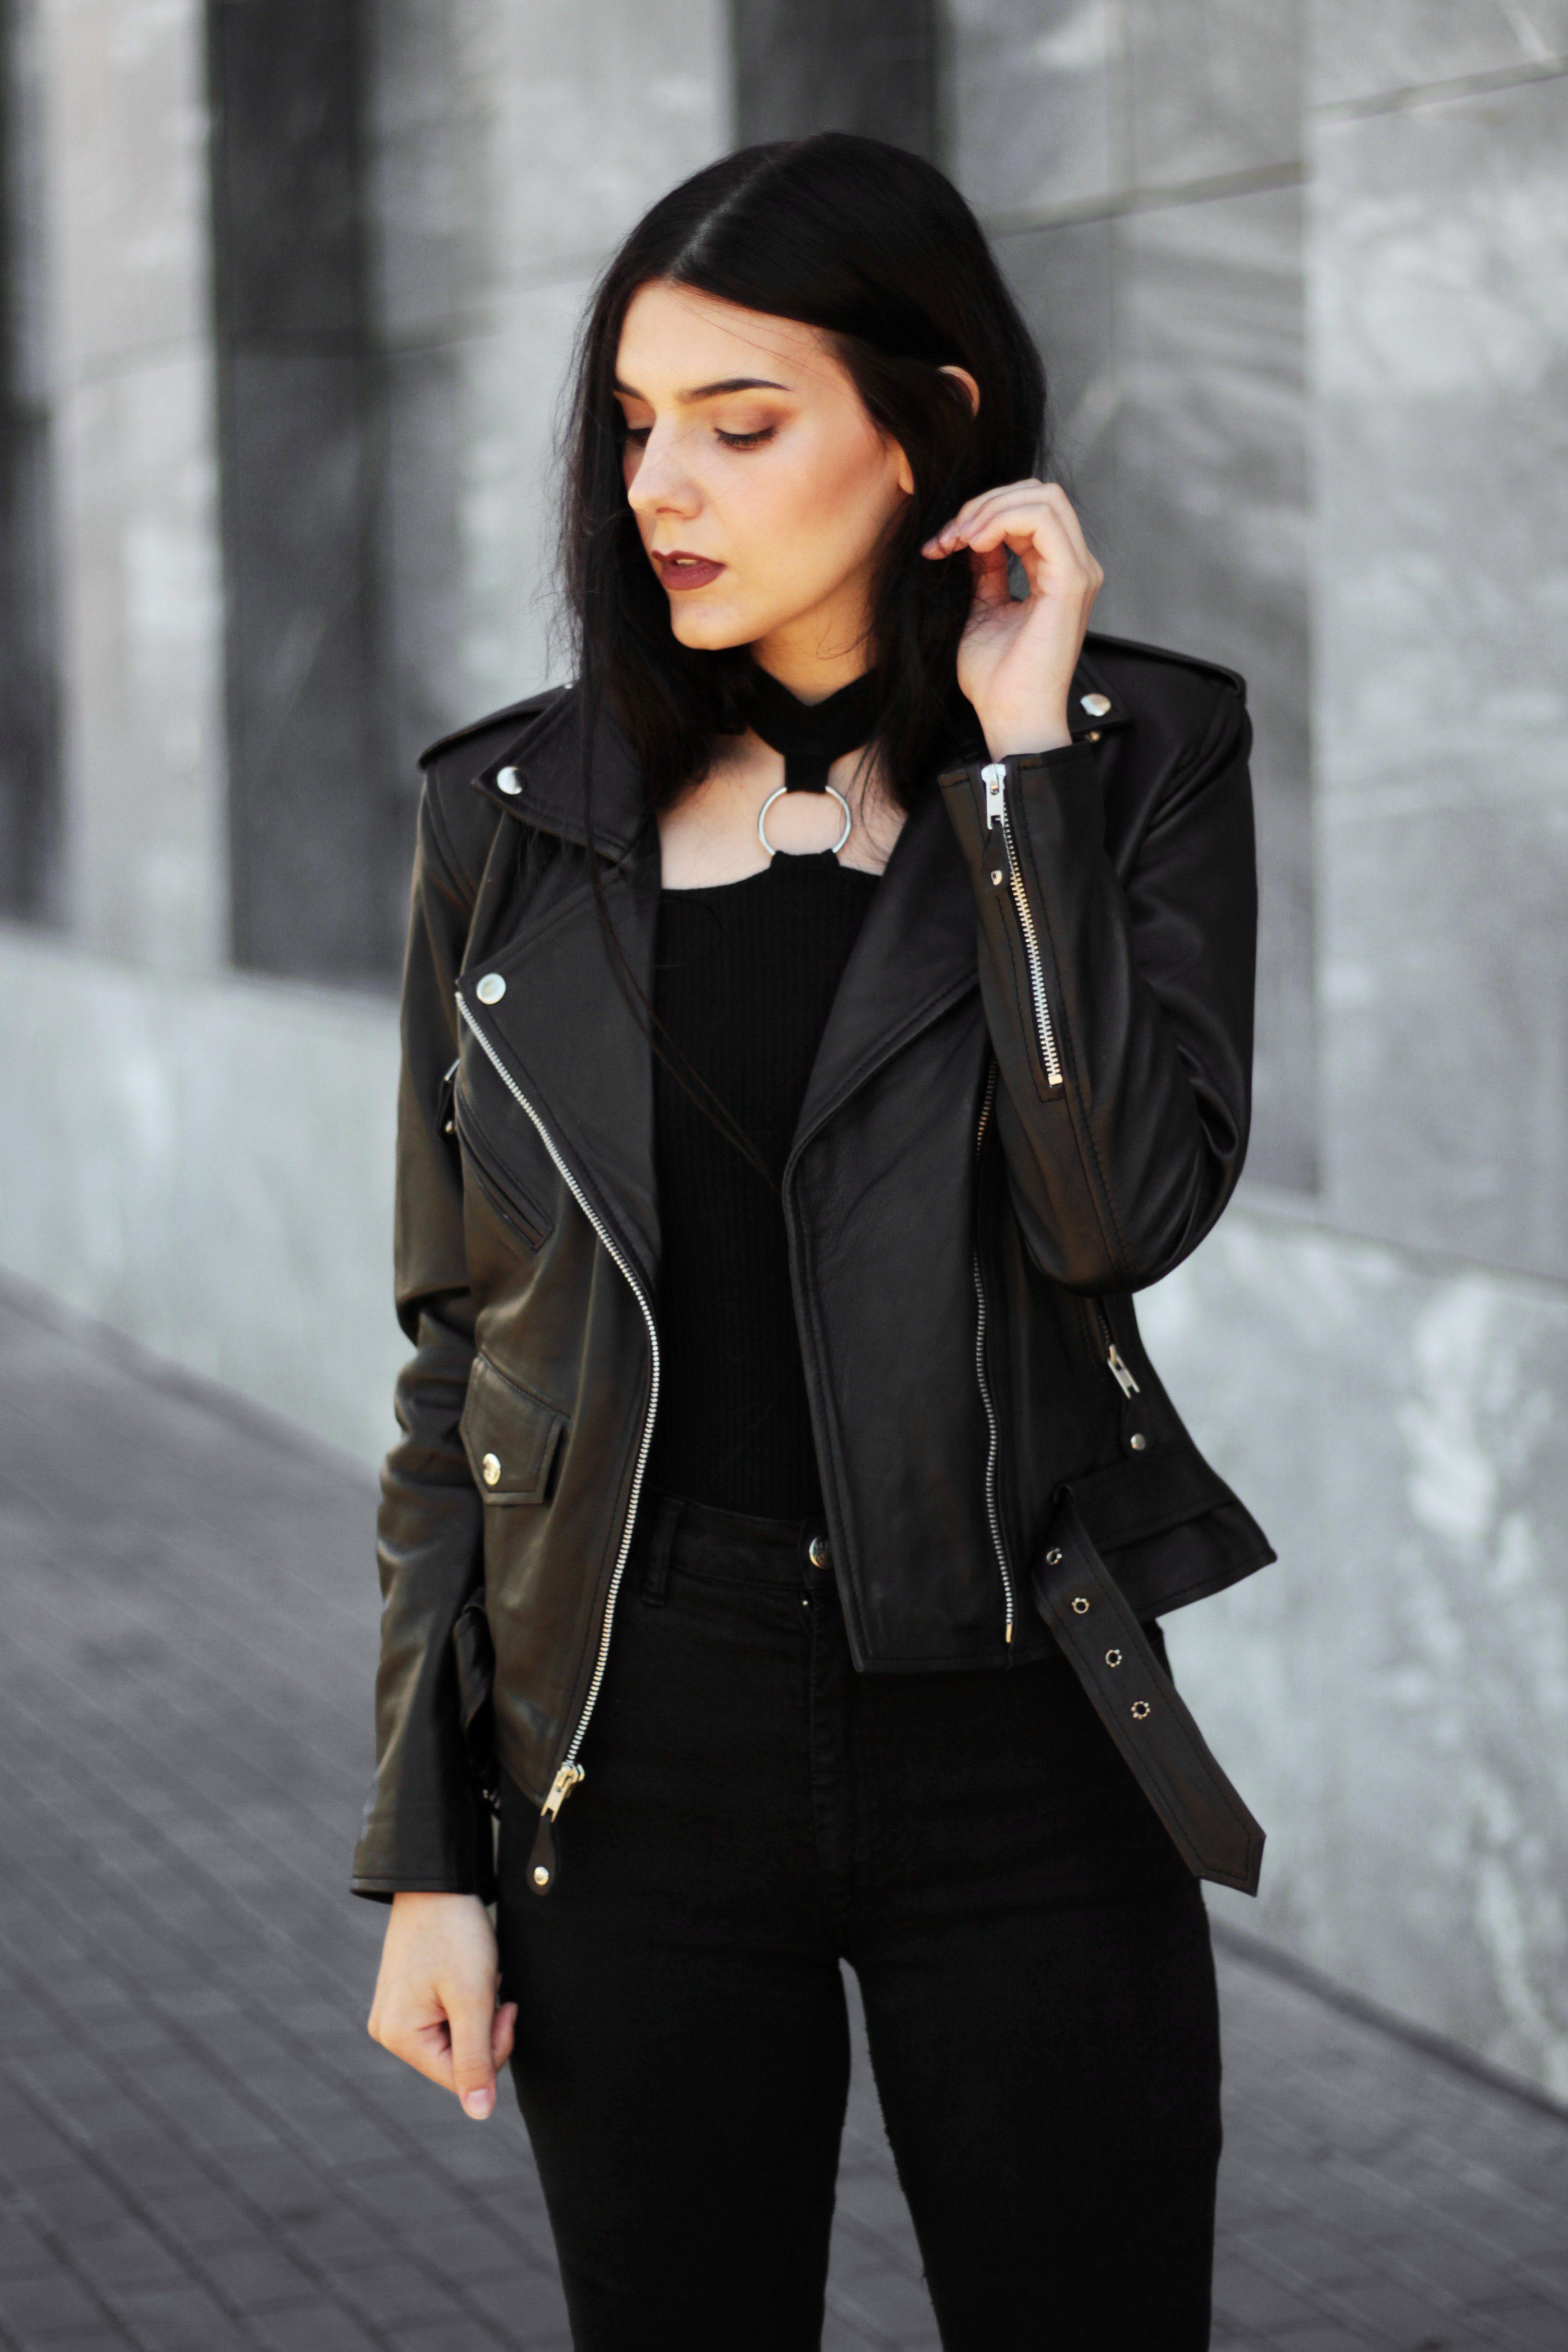 Leather Skin Brando Women Black Biker Motorcycle Leather